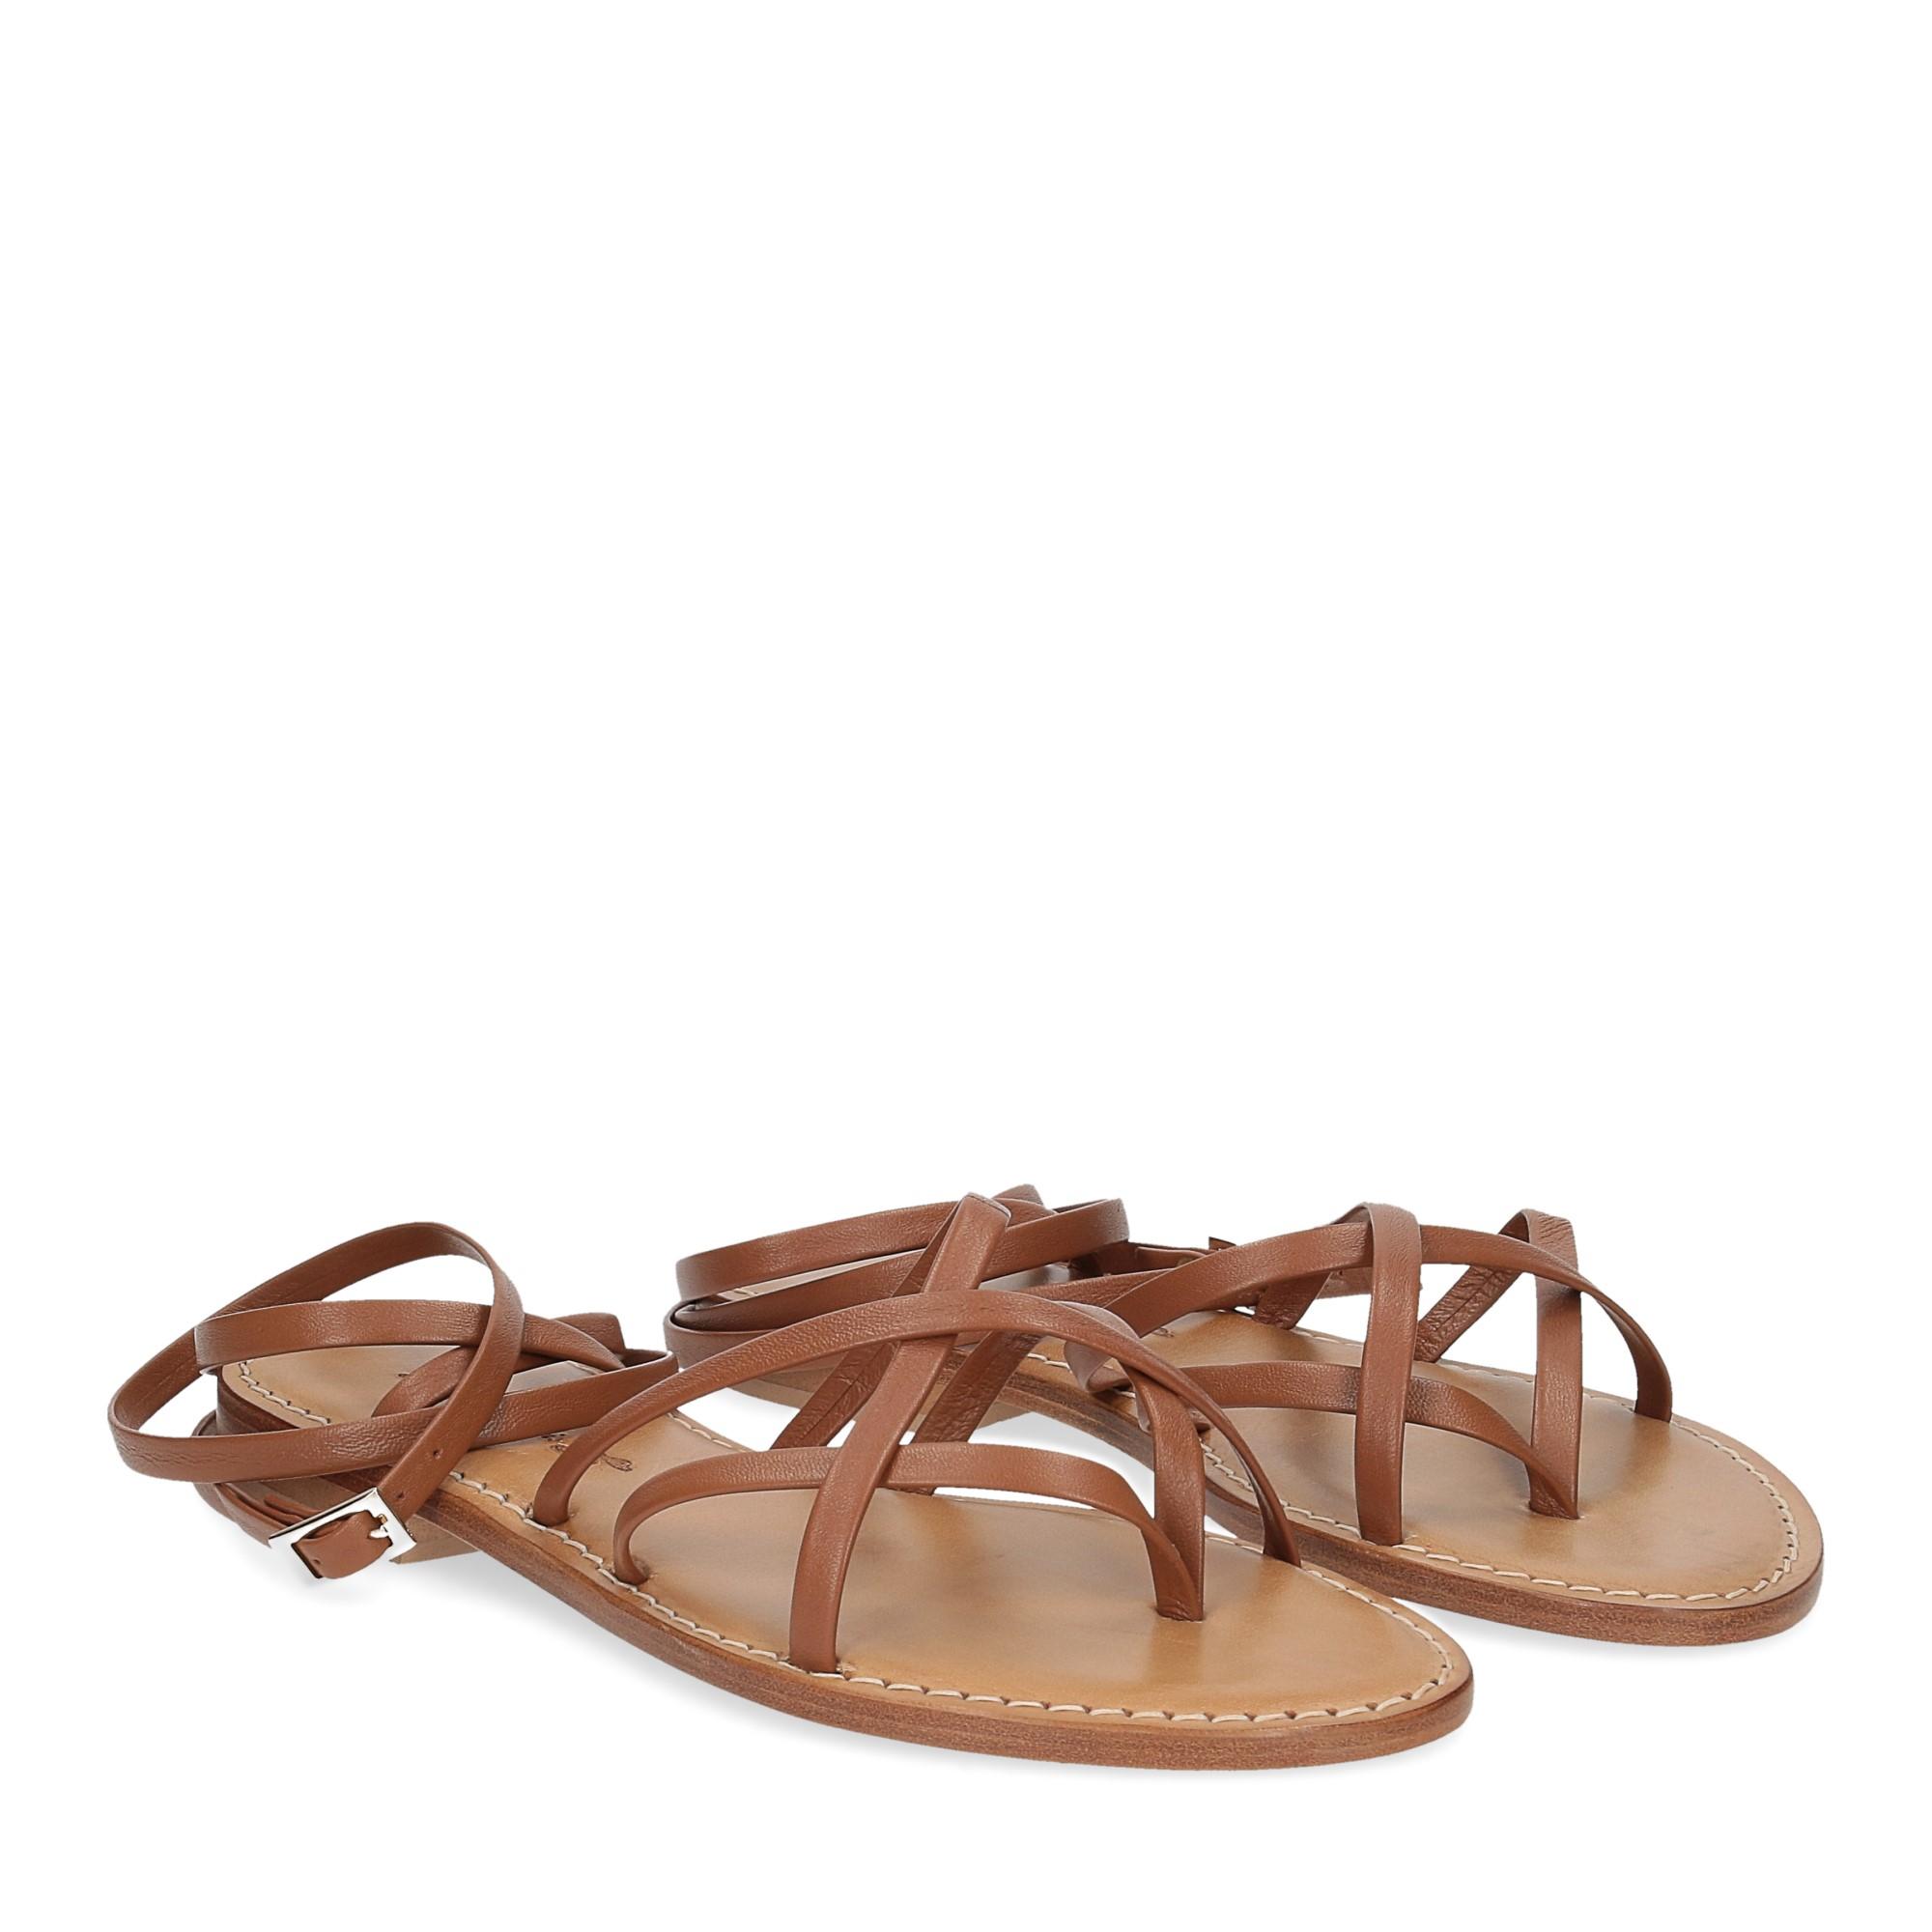 De Capri a Paris sandalo infradito 28 sandy marrone